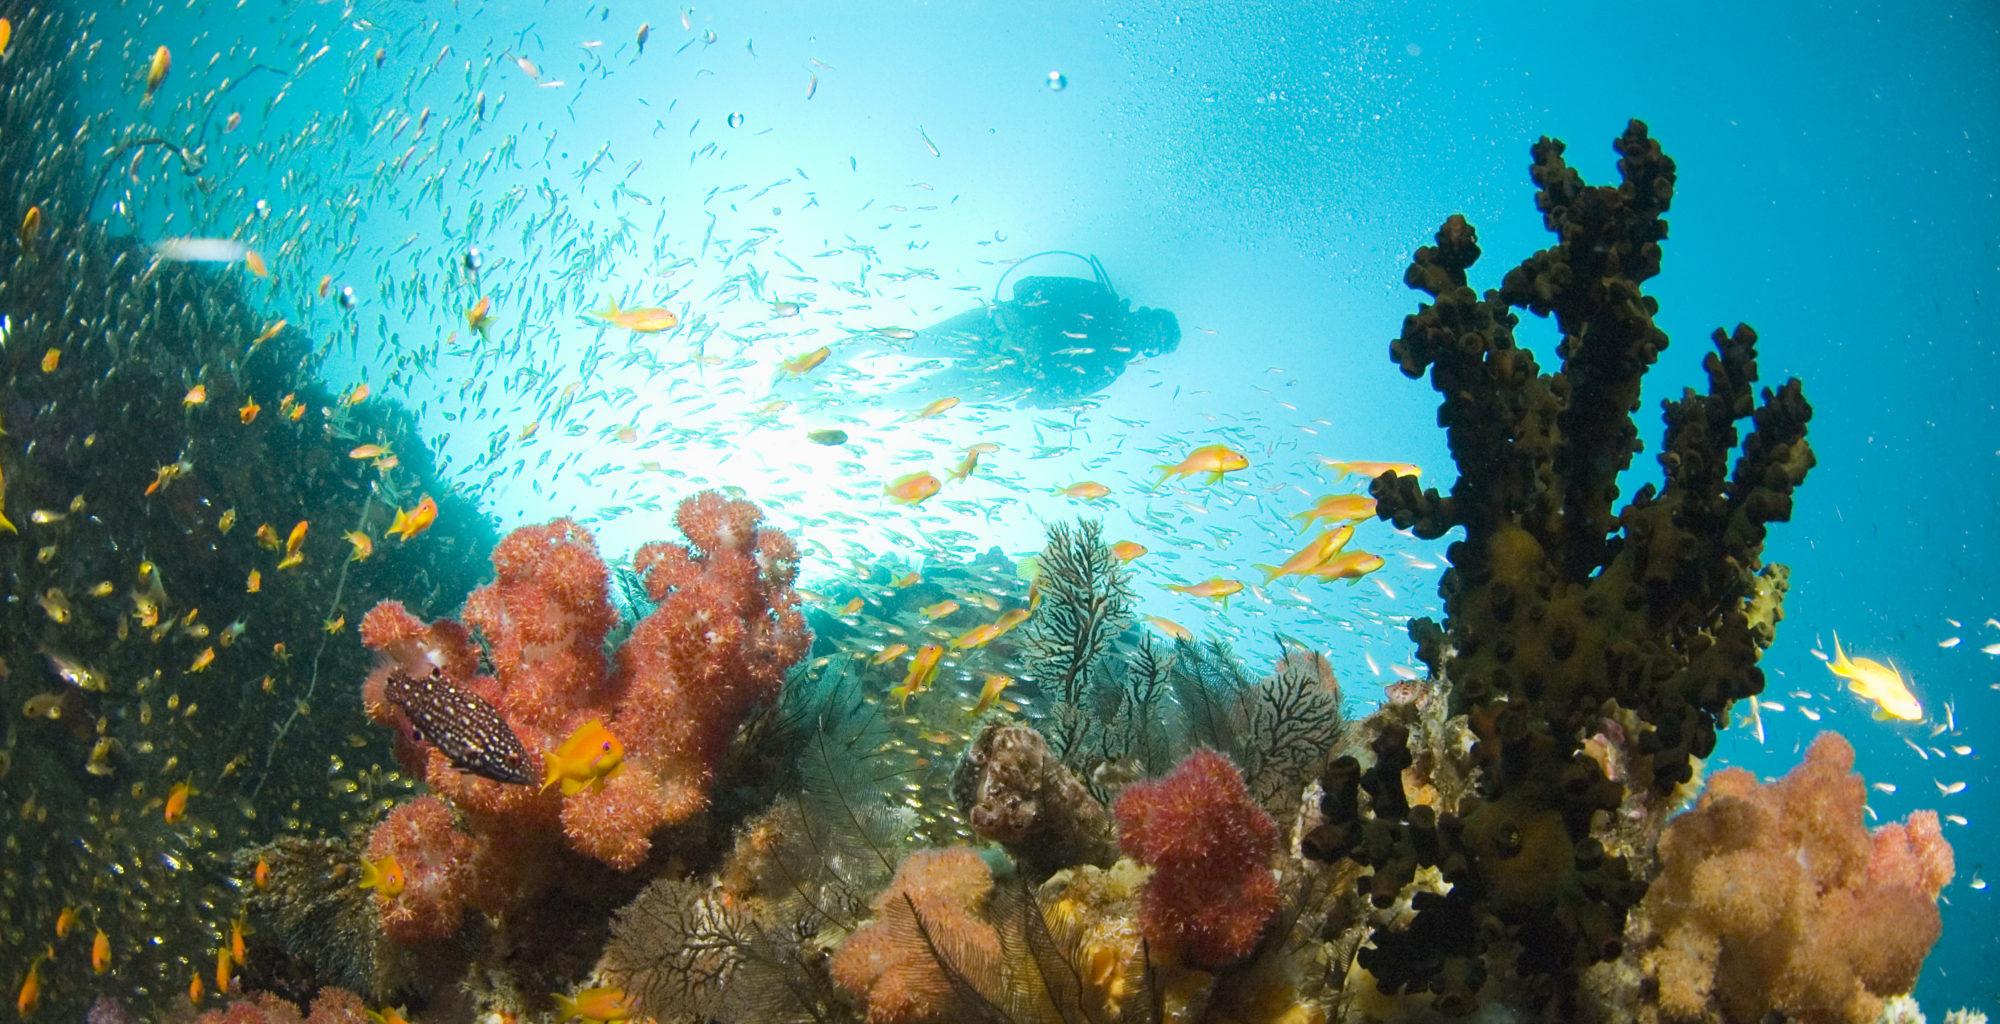 Mozambique-Bazaruto-Archipelago-Underwater-Sealife